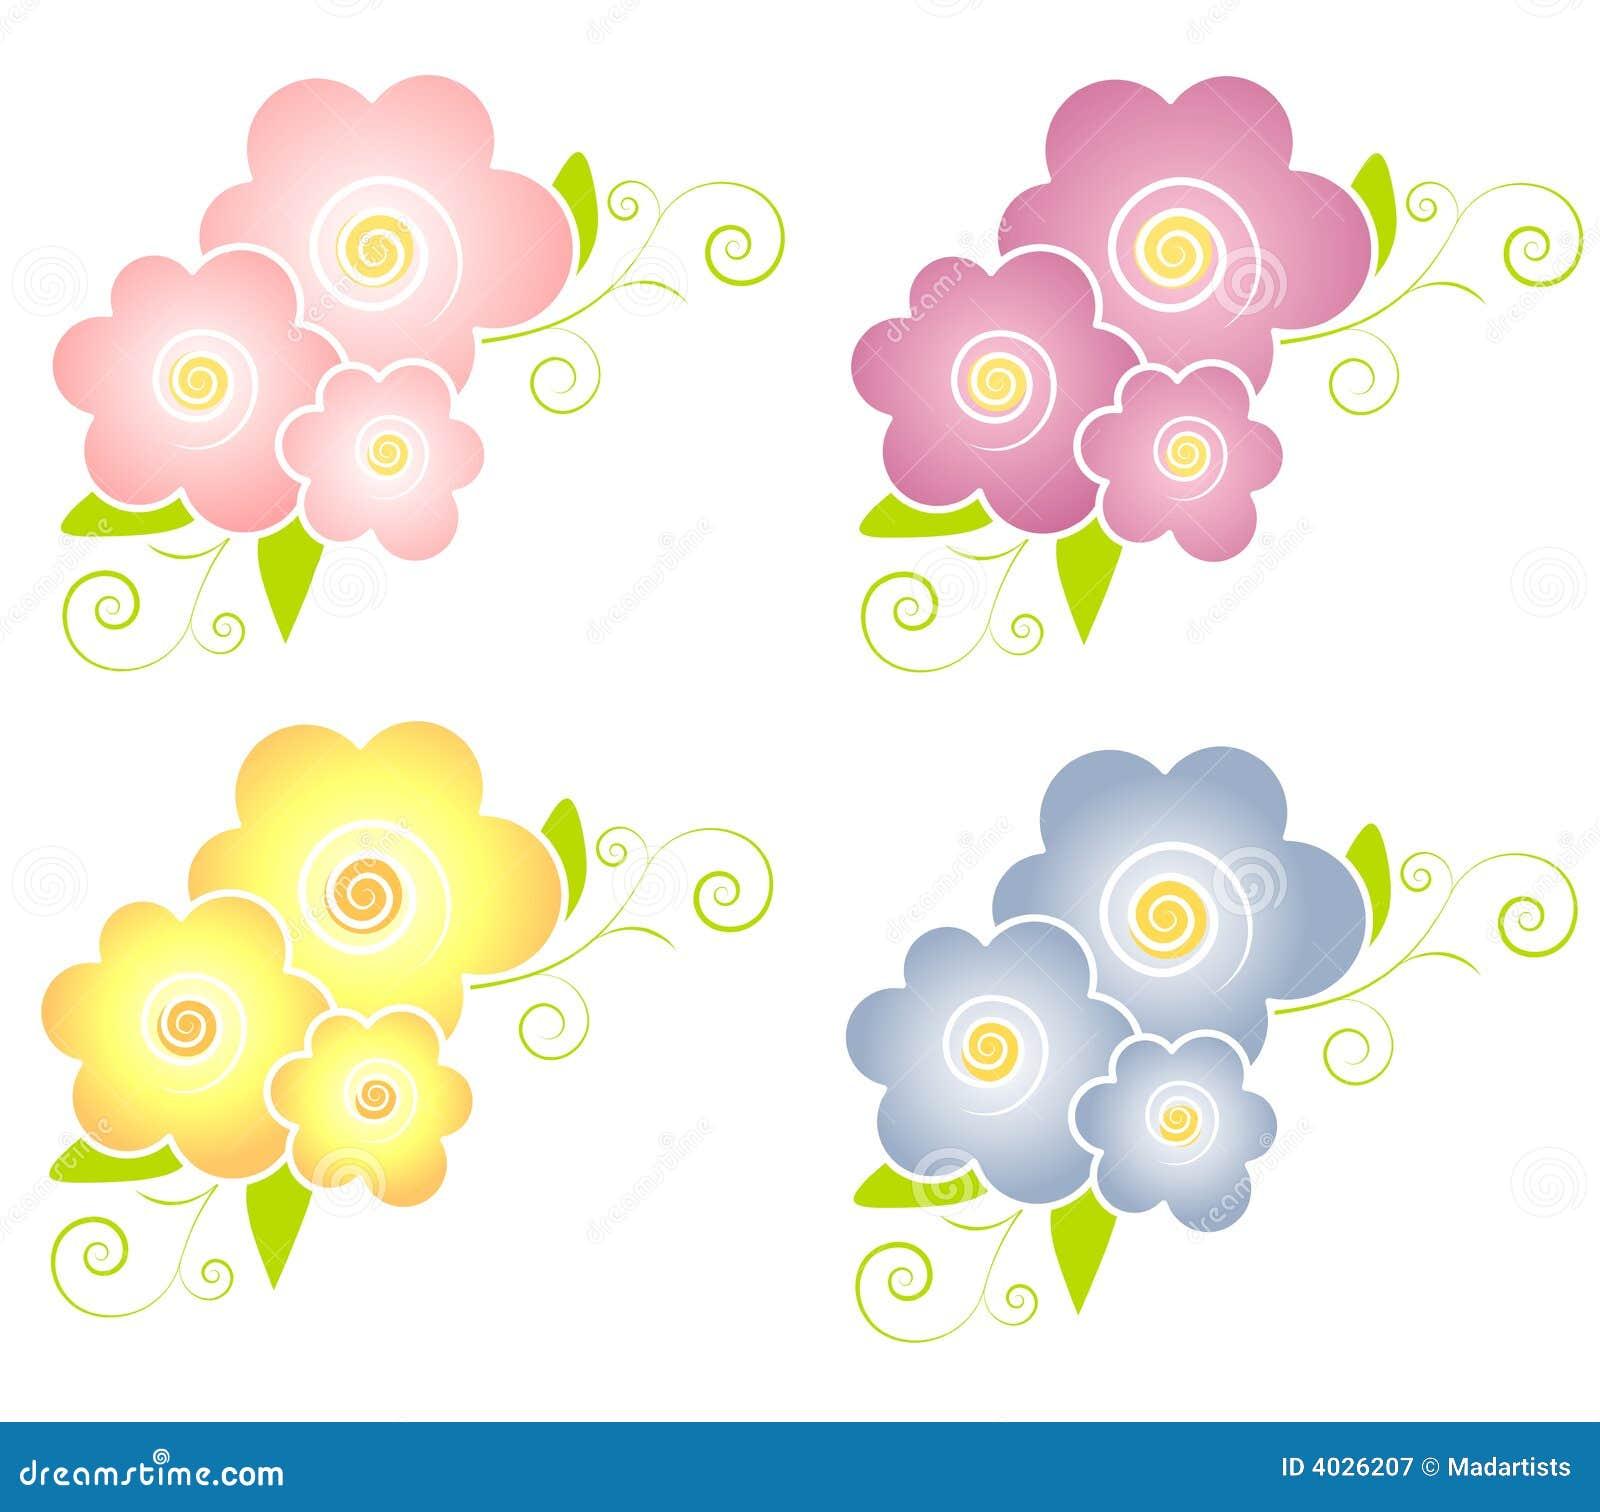 Decorative Spring Flowers Design Elements Stock Illustration